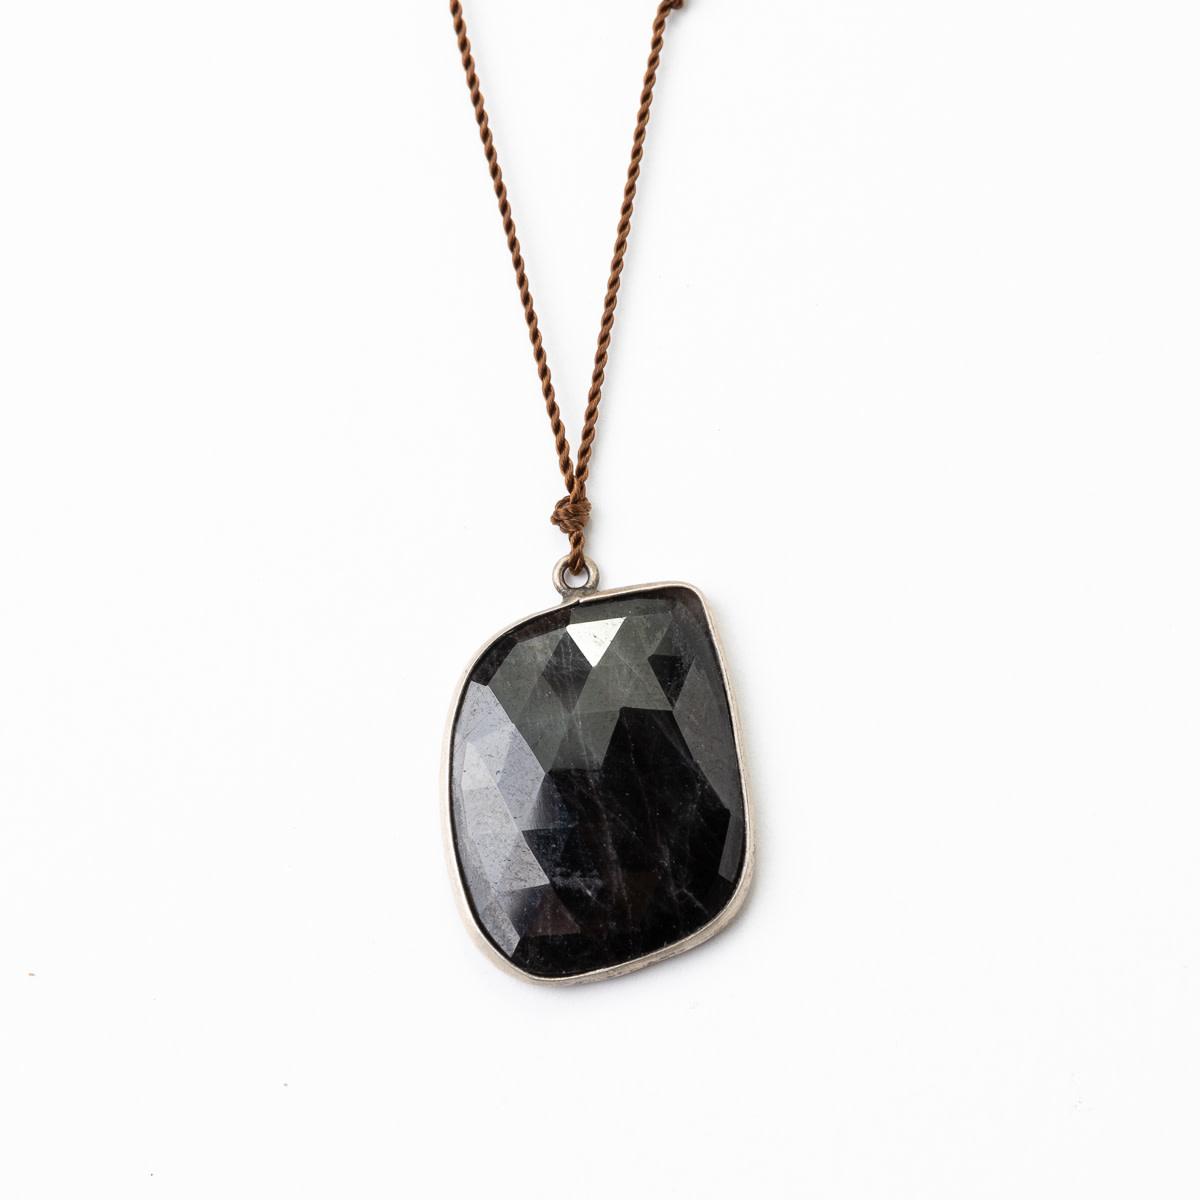 Margaret Solow - MS Margaret Solow Black Spinel Necklace